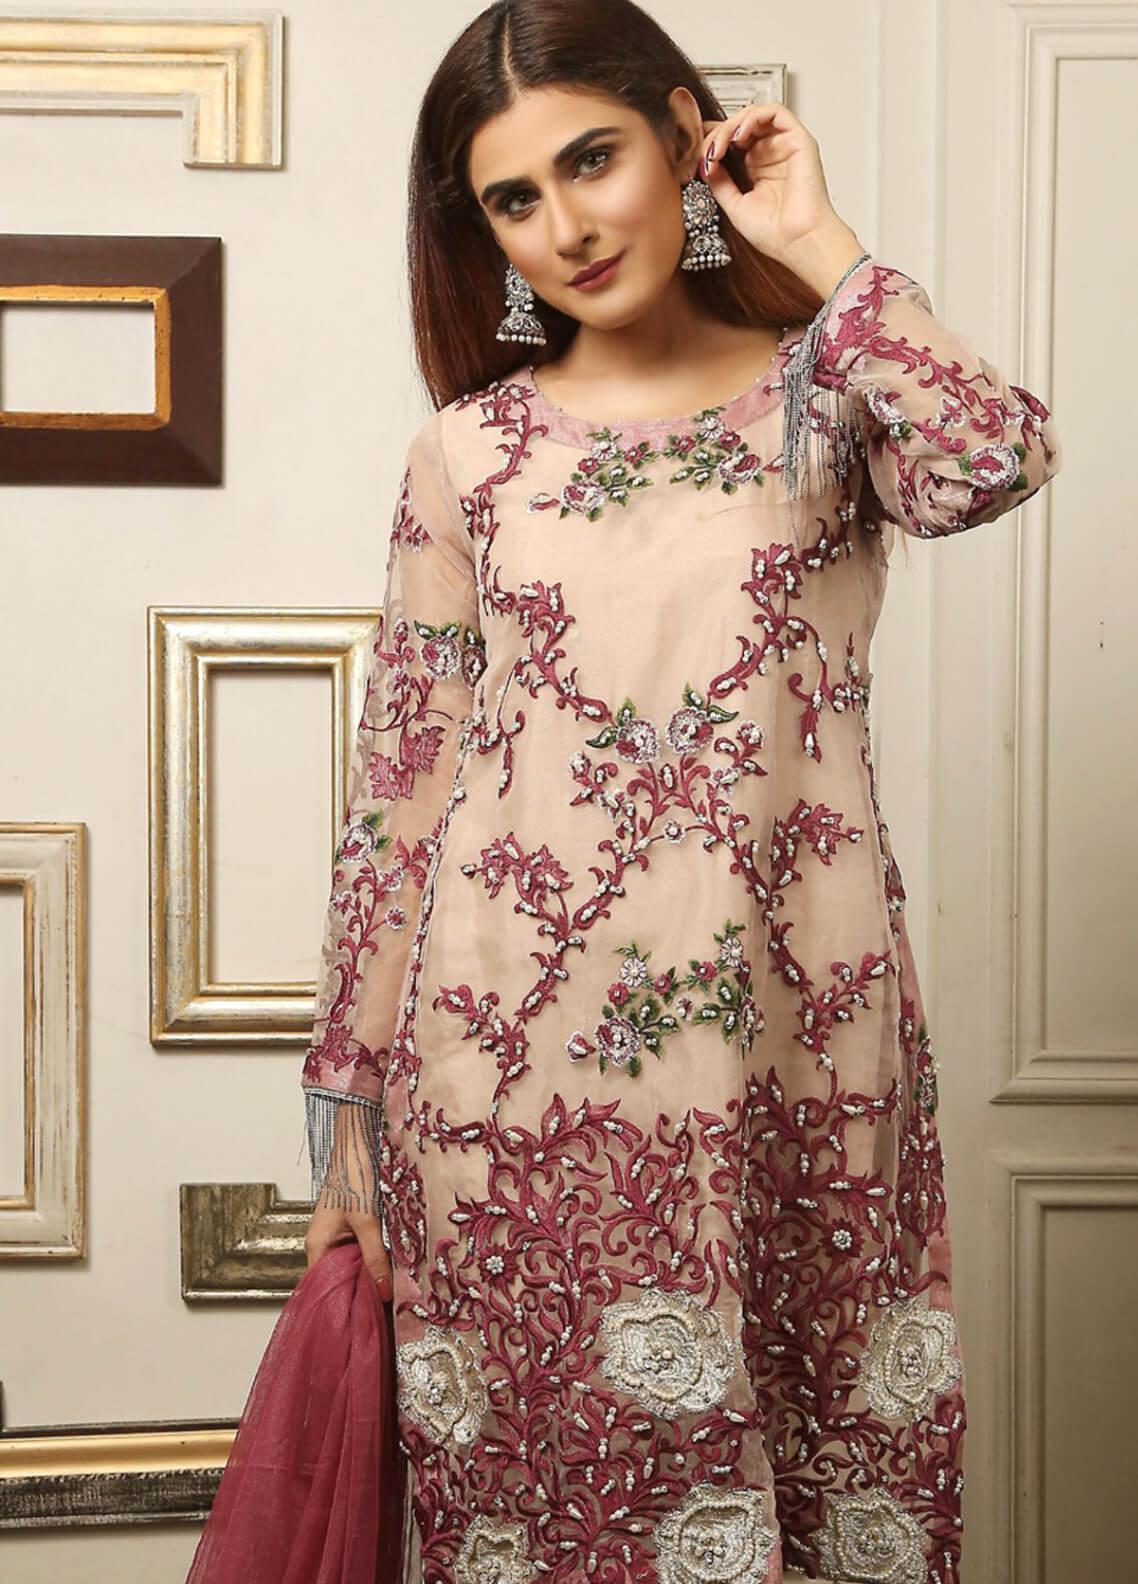 Maliha Kamal Embroidered Chiffon Unstitched 3 Piece Suit MK19C 074 POWDER HINT - Luxury Collection